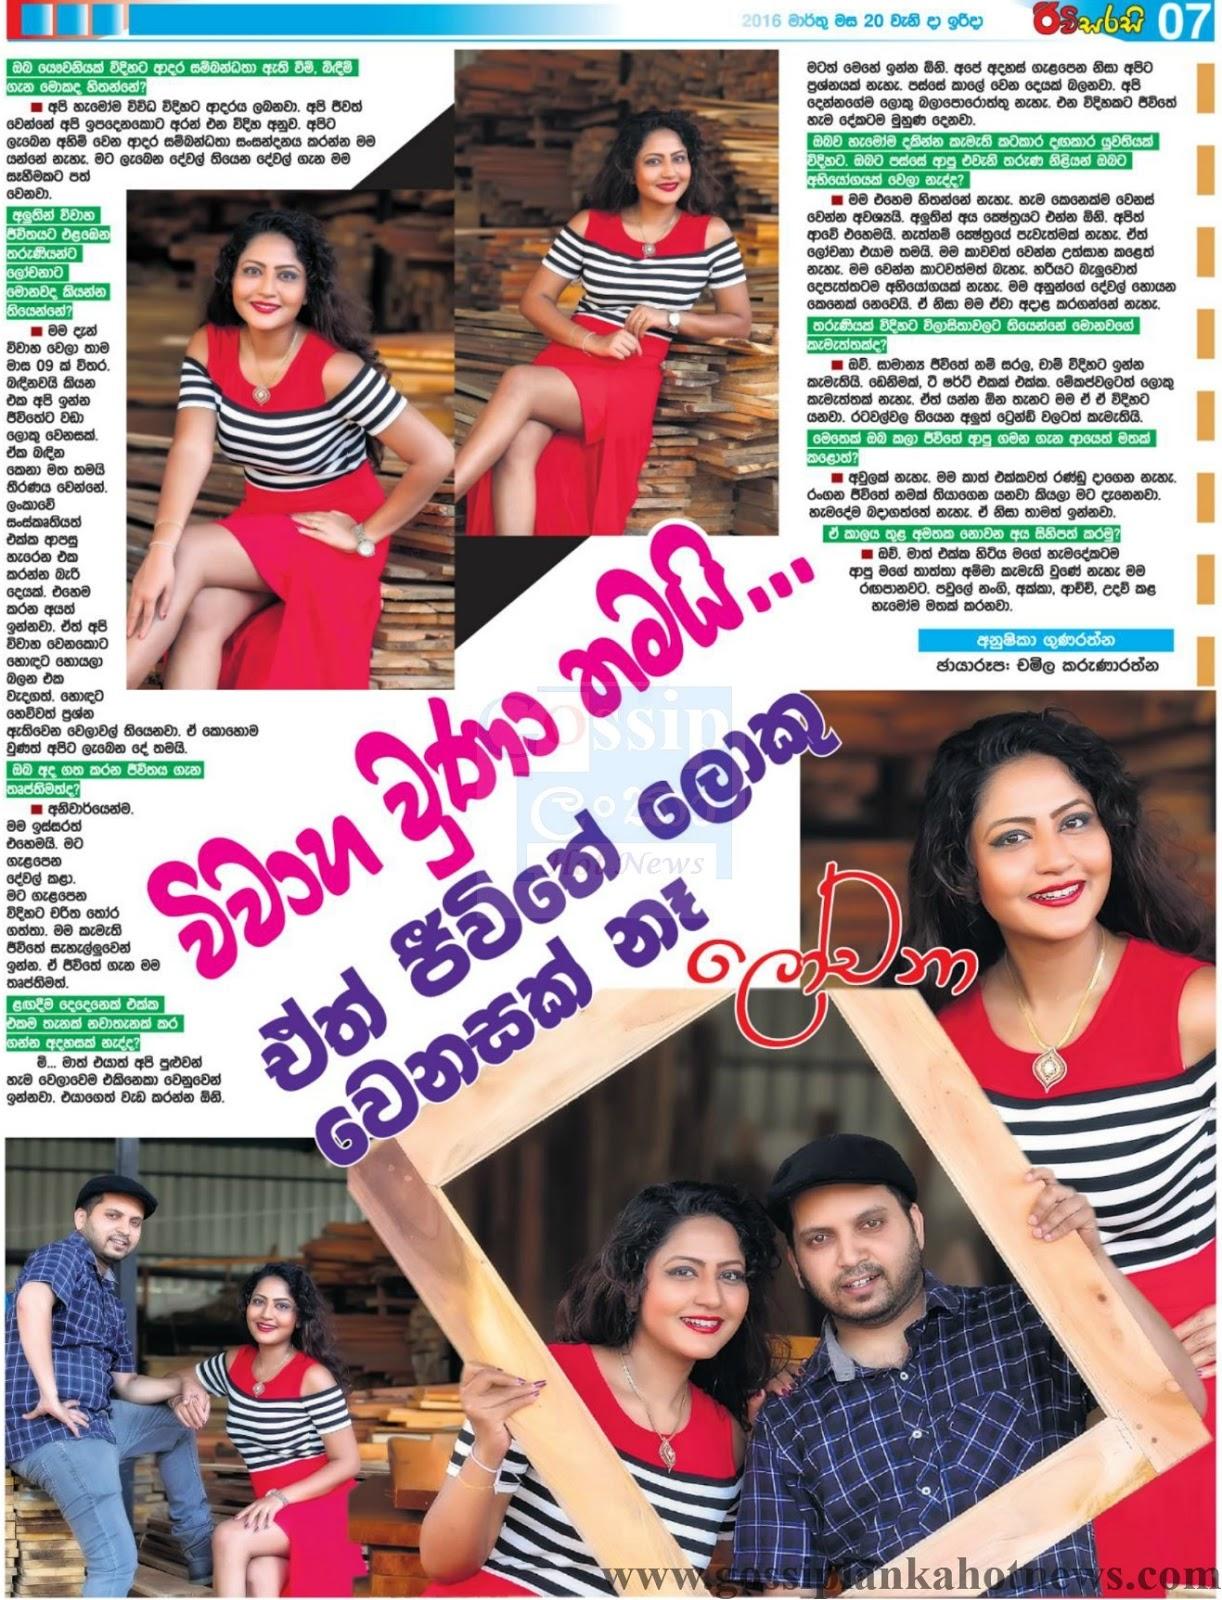 Rivira sunday sinhala papers